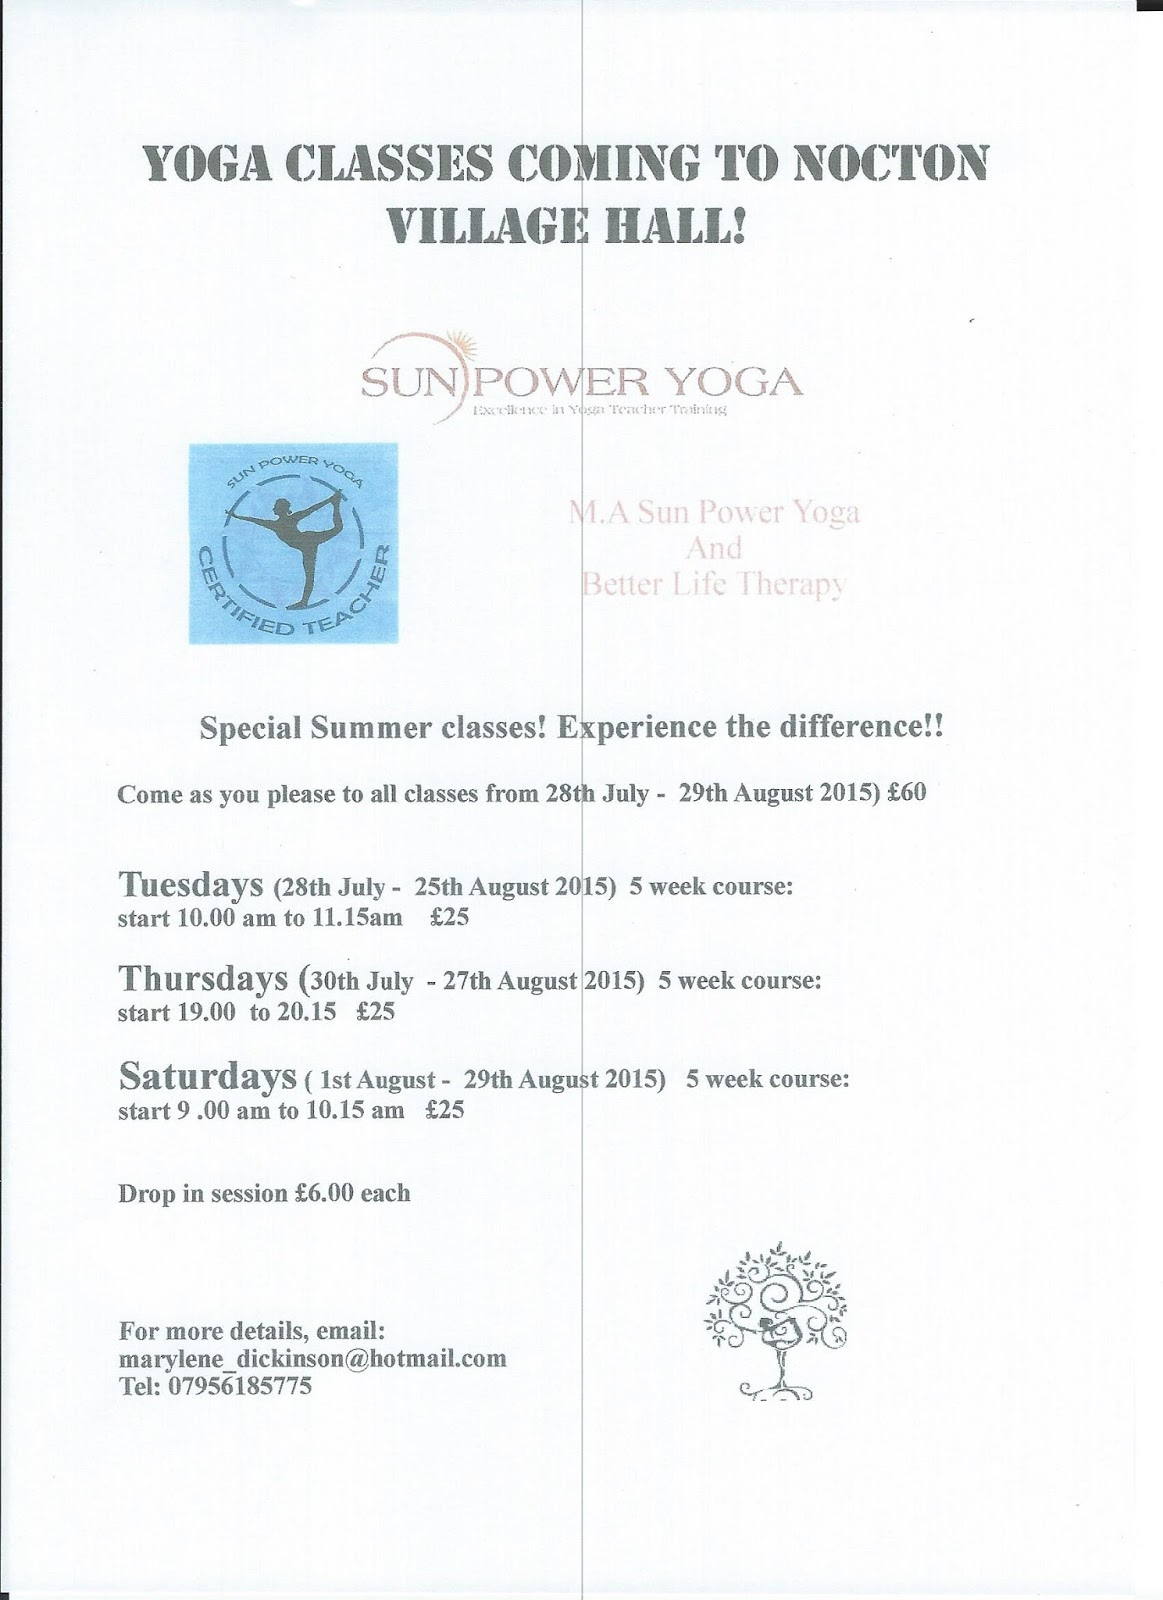 Nocton in Lincolnshire: Yoga at Nocton Village Hall